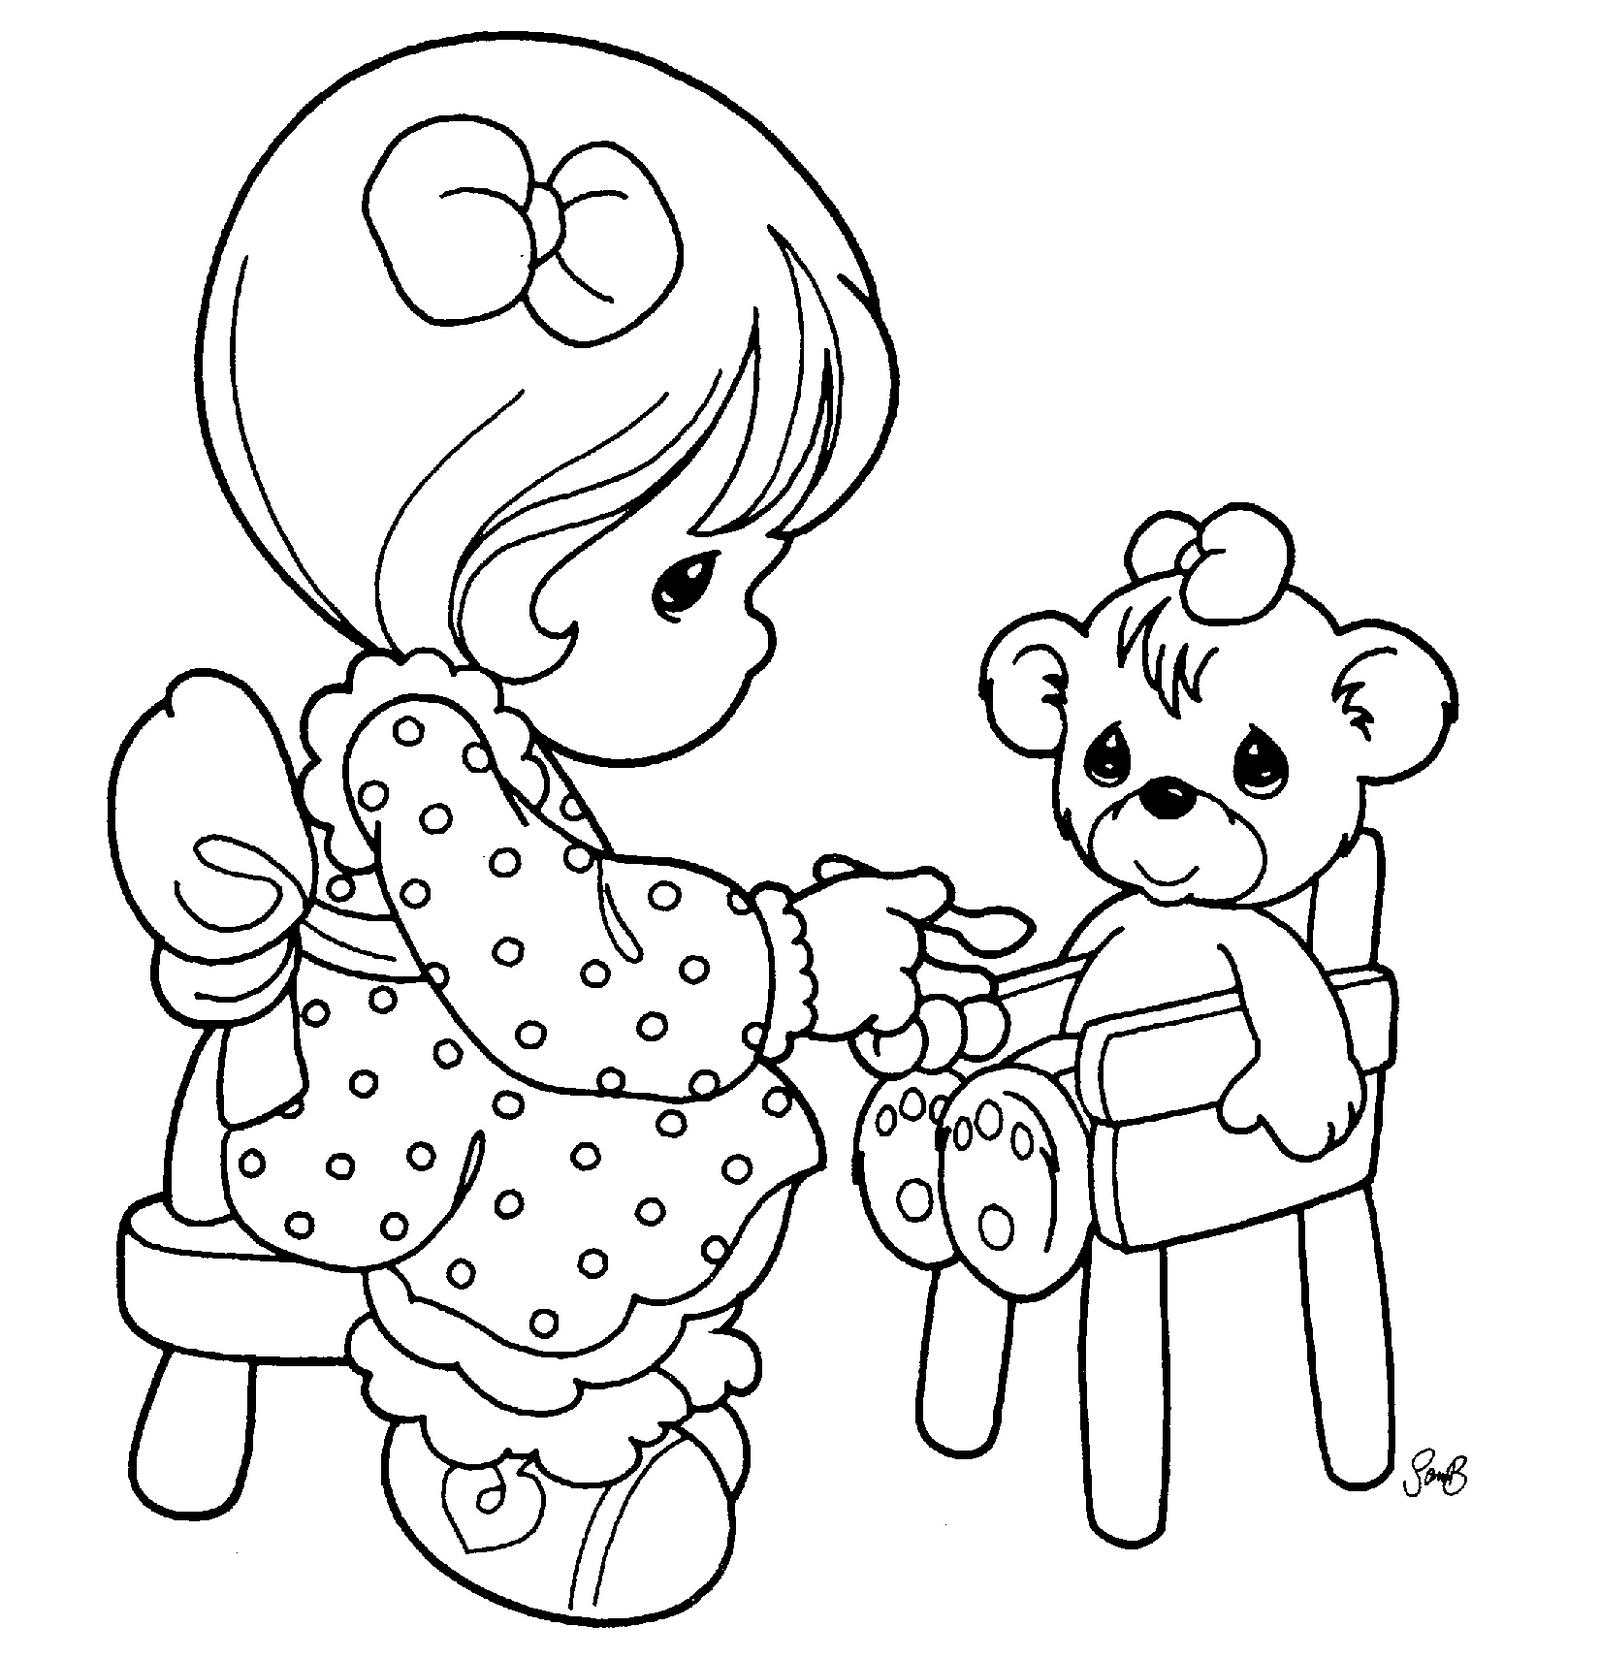 Precious Moments feeding Teddy Bear Coloring Page